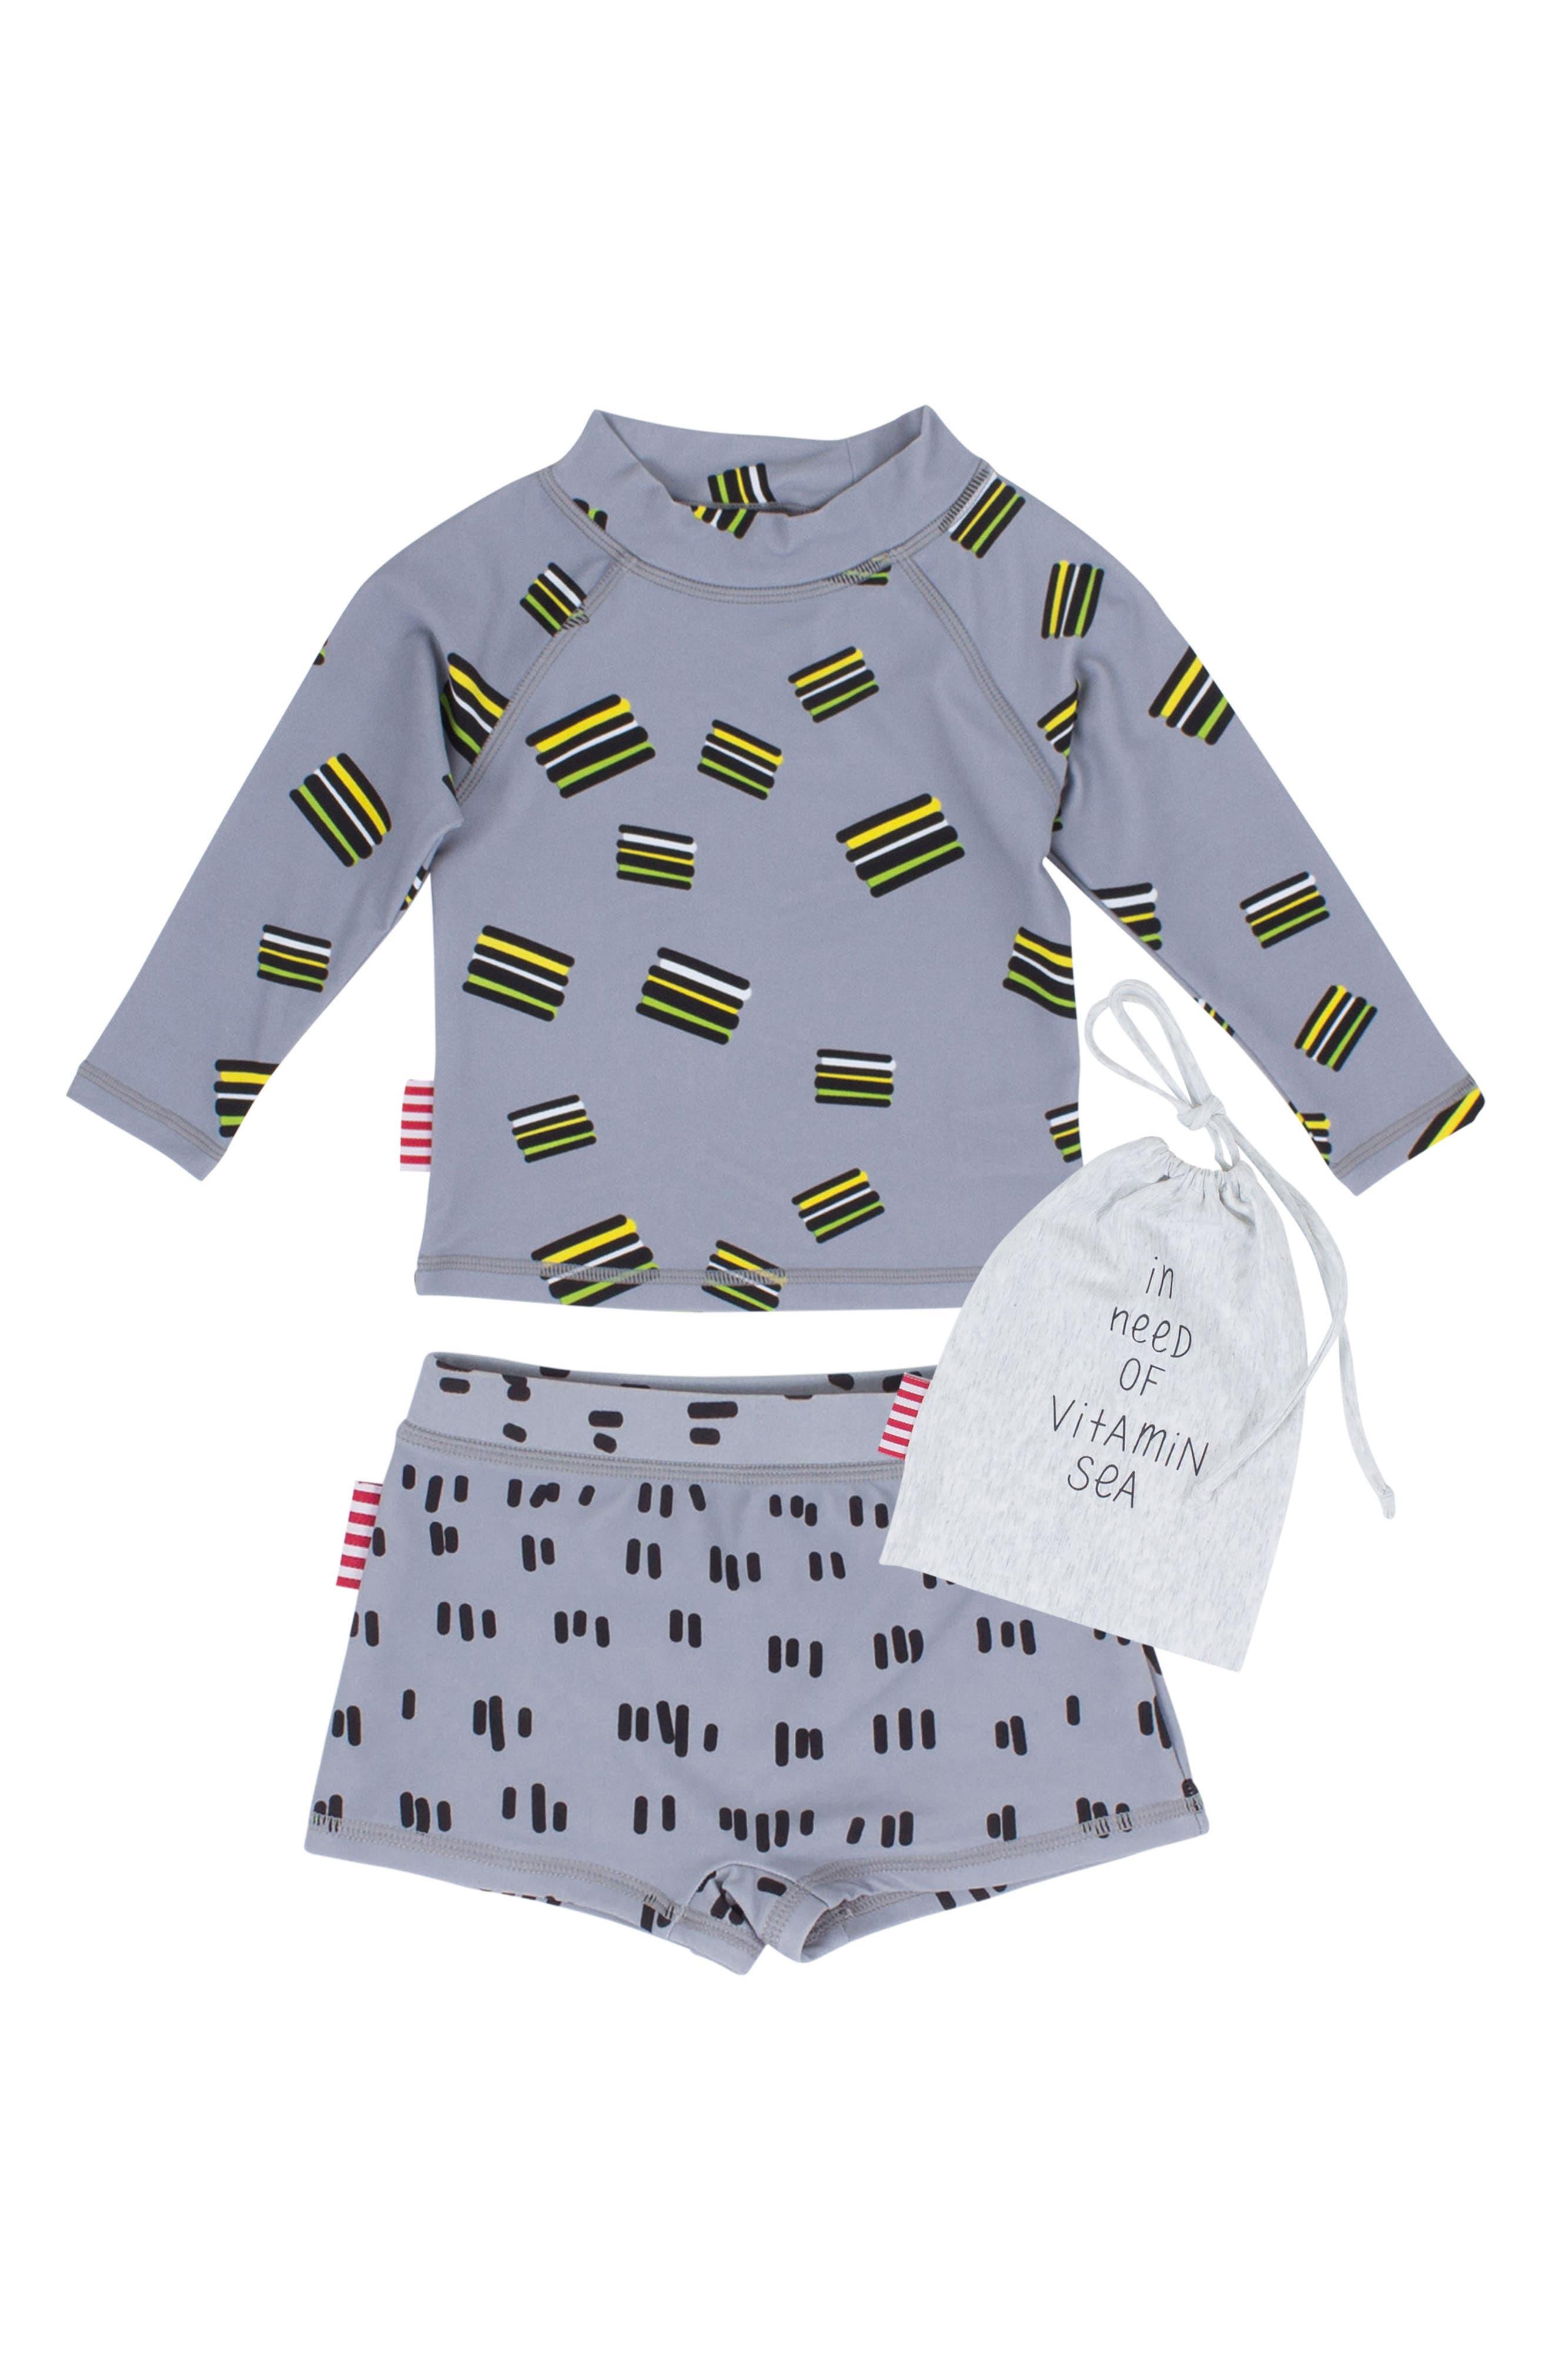 SOOKIbaby Licorice Two-Piece Rashguard Swim Suit (Baby Boys & Toddler Boys)